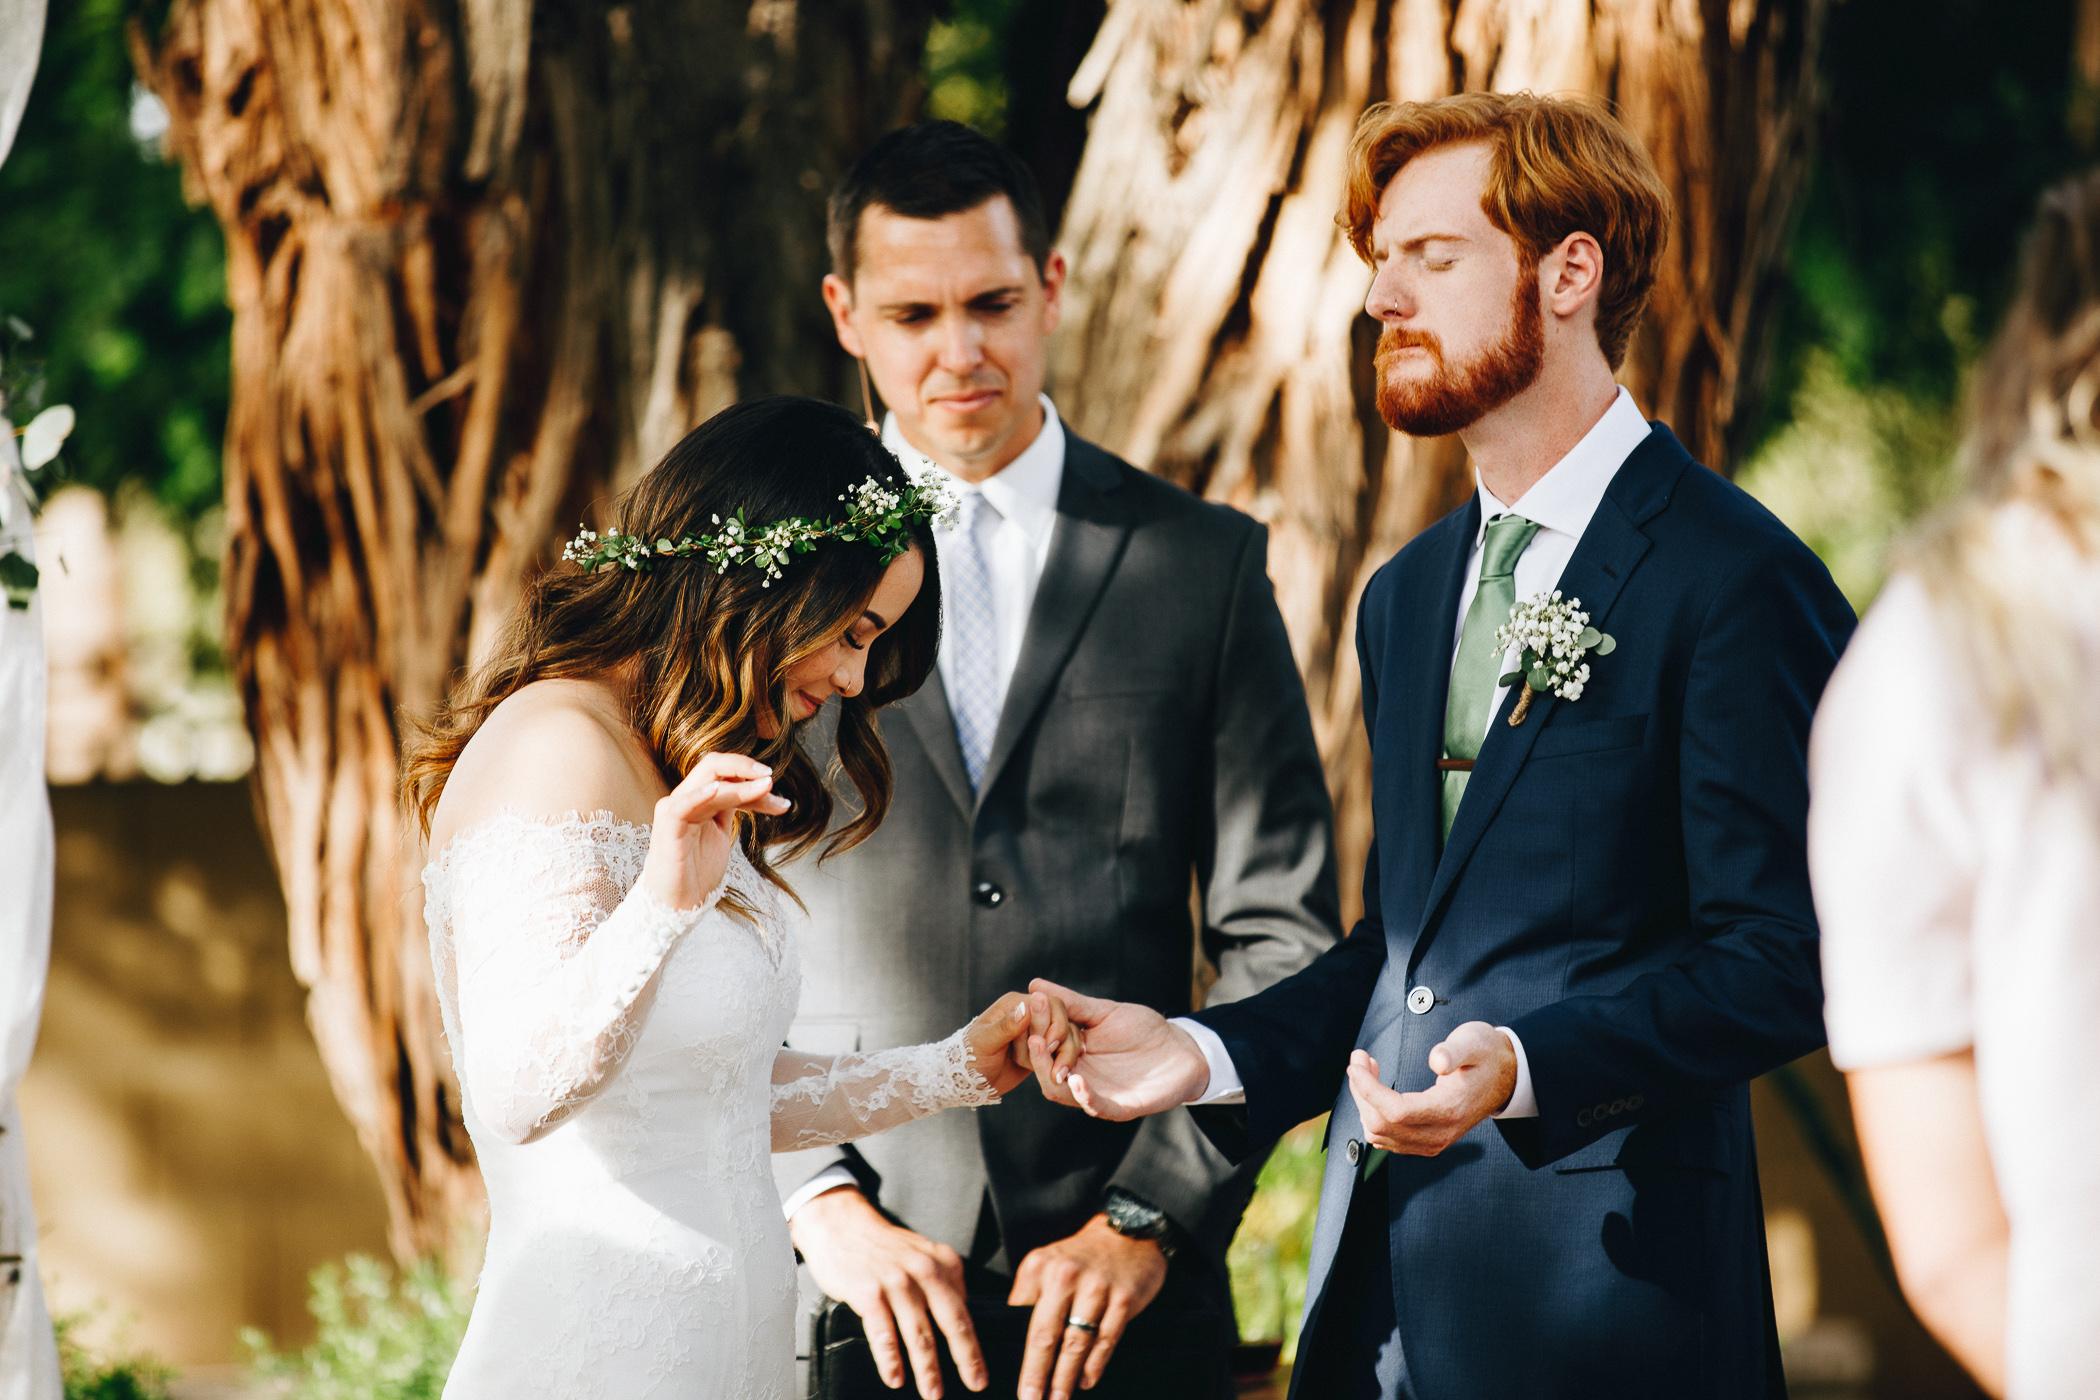 181104-Luxium-Weddings-Arizona-@matt__Le-Brandon-Kariana-Phoenix-Valley-Garden-Center-1062.jpg